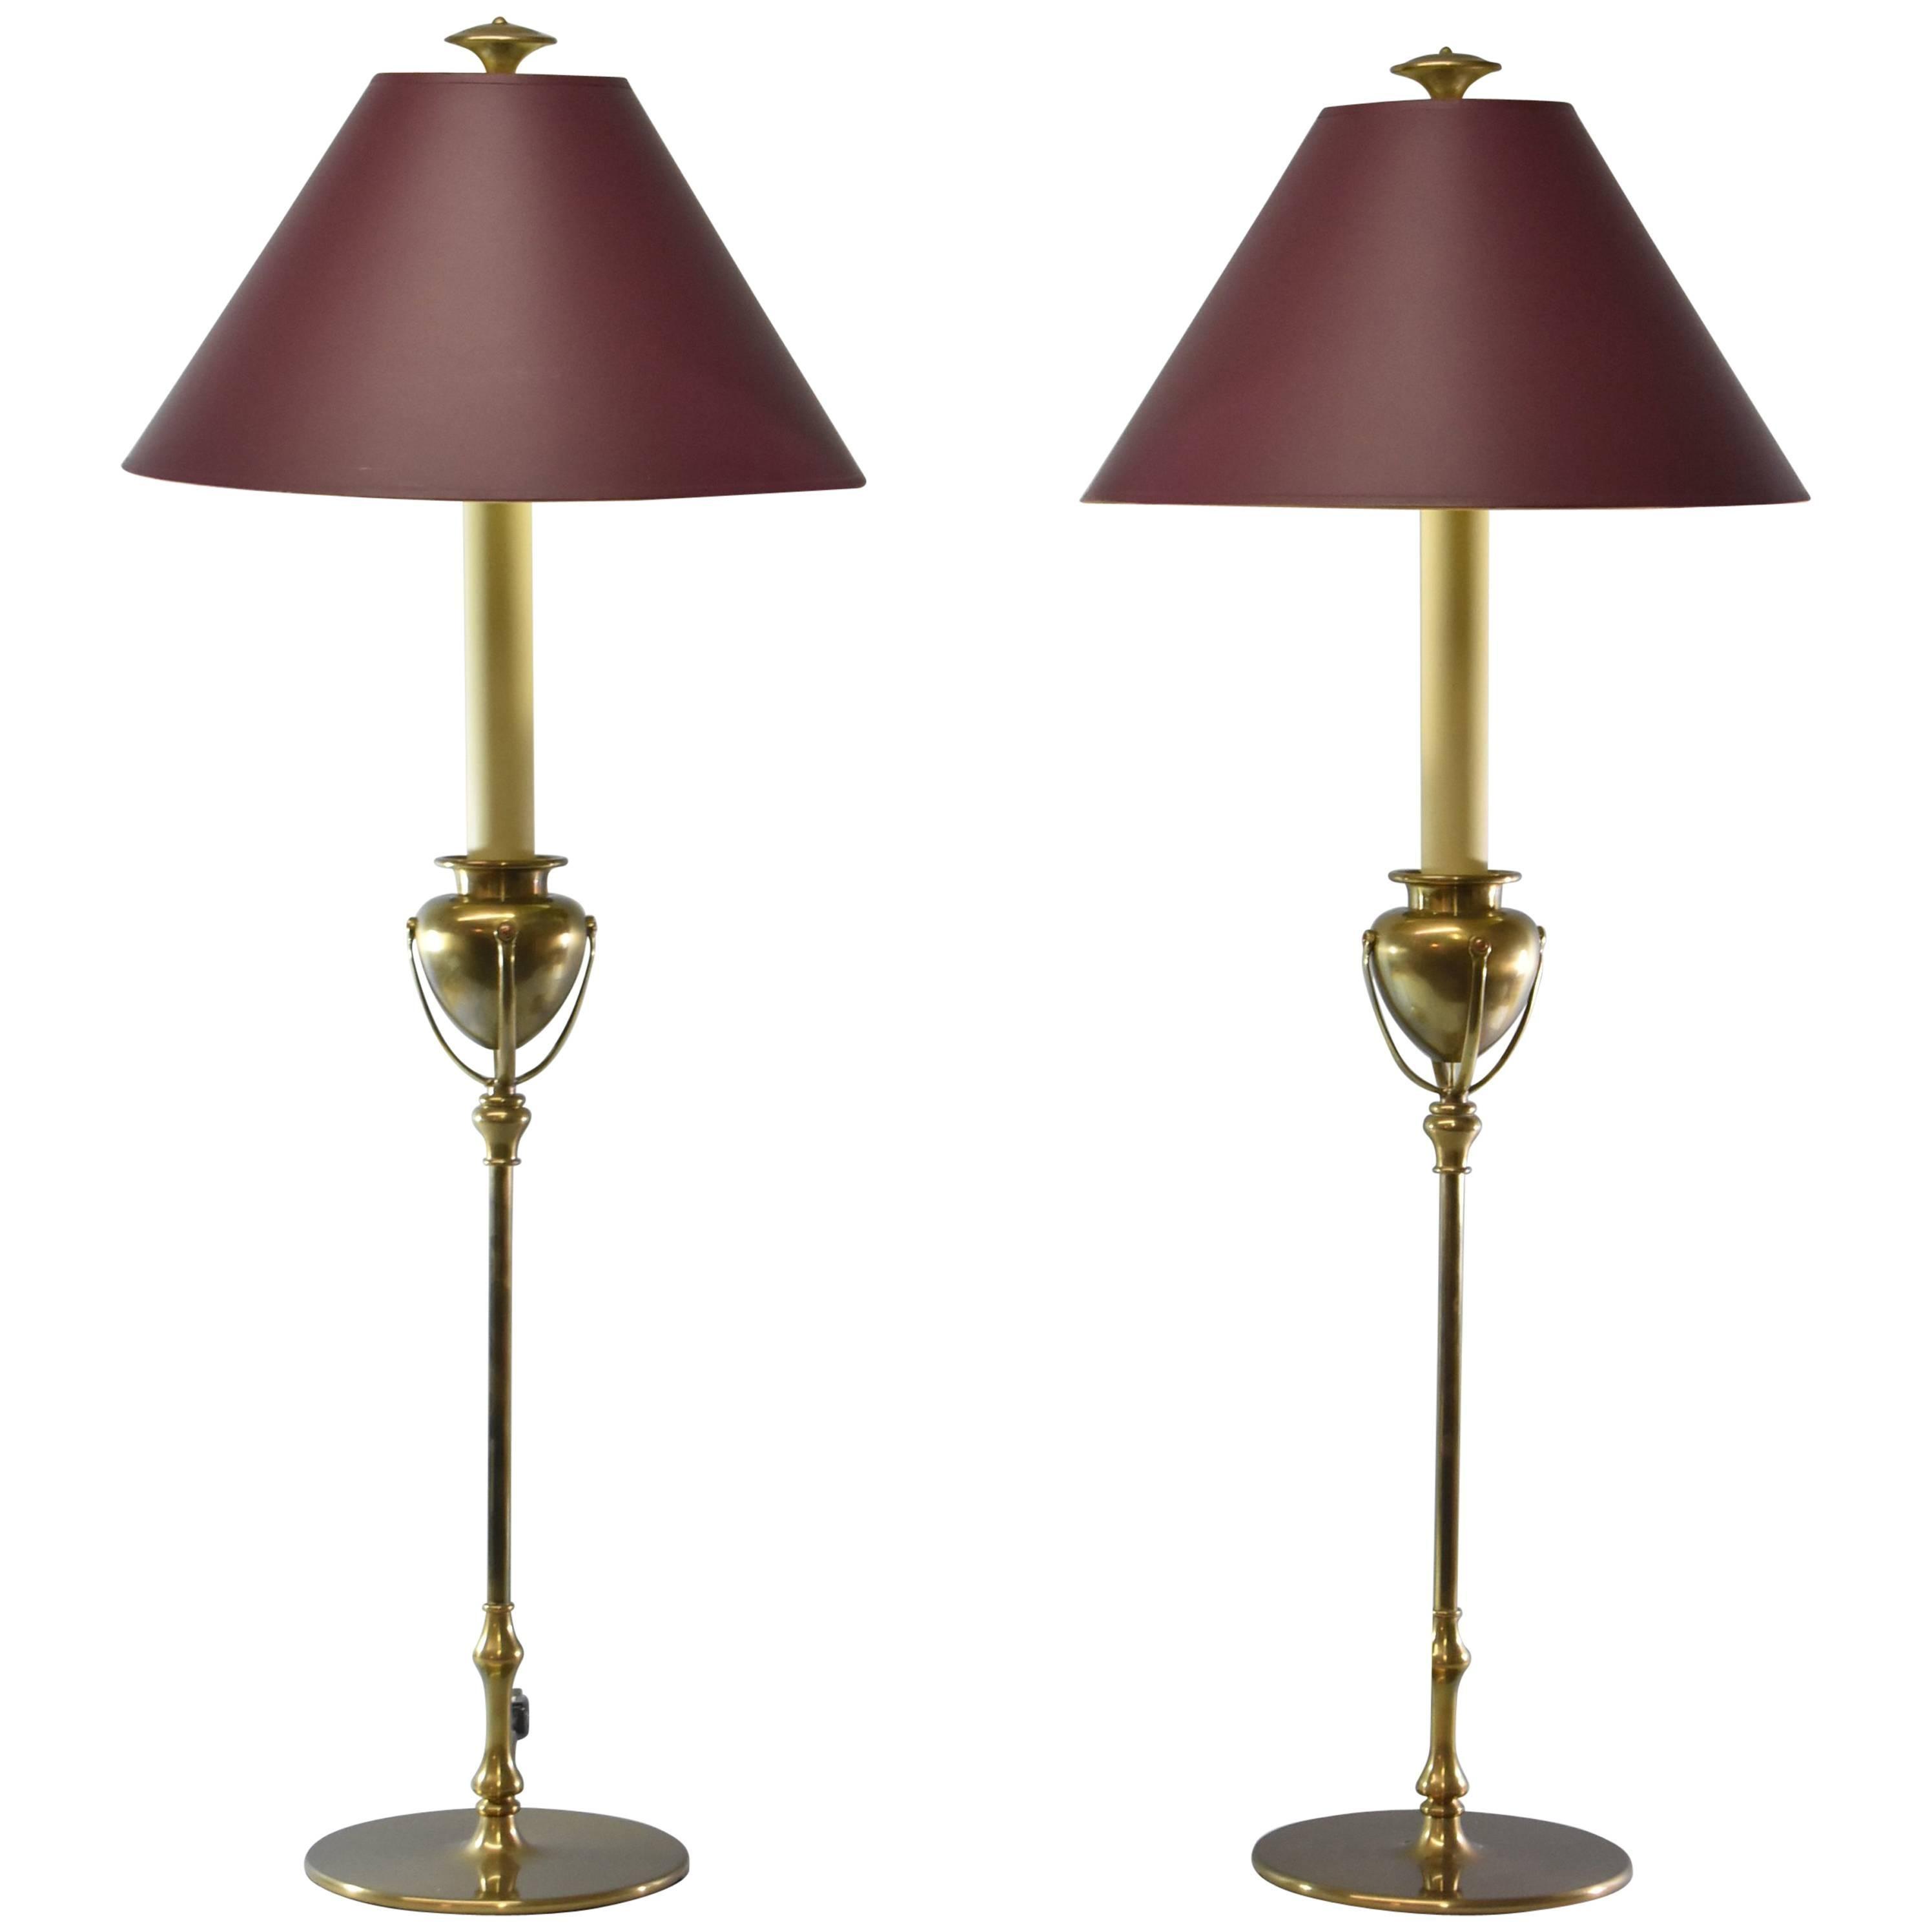 Pair of Tall Chapman Brass Buffet Lamps 1985 at 1stdibs